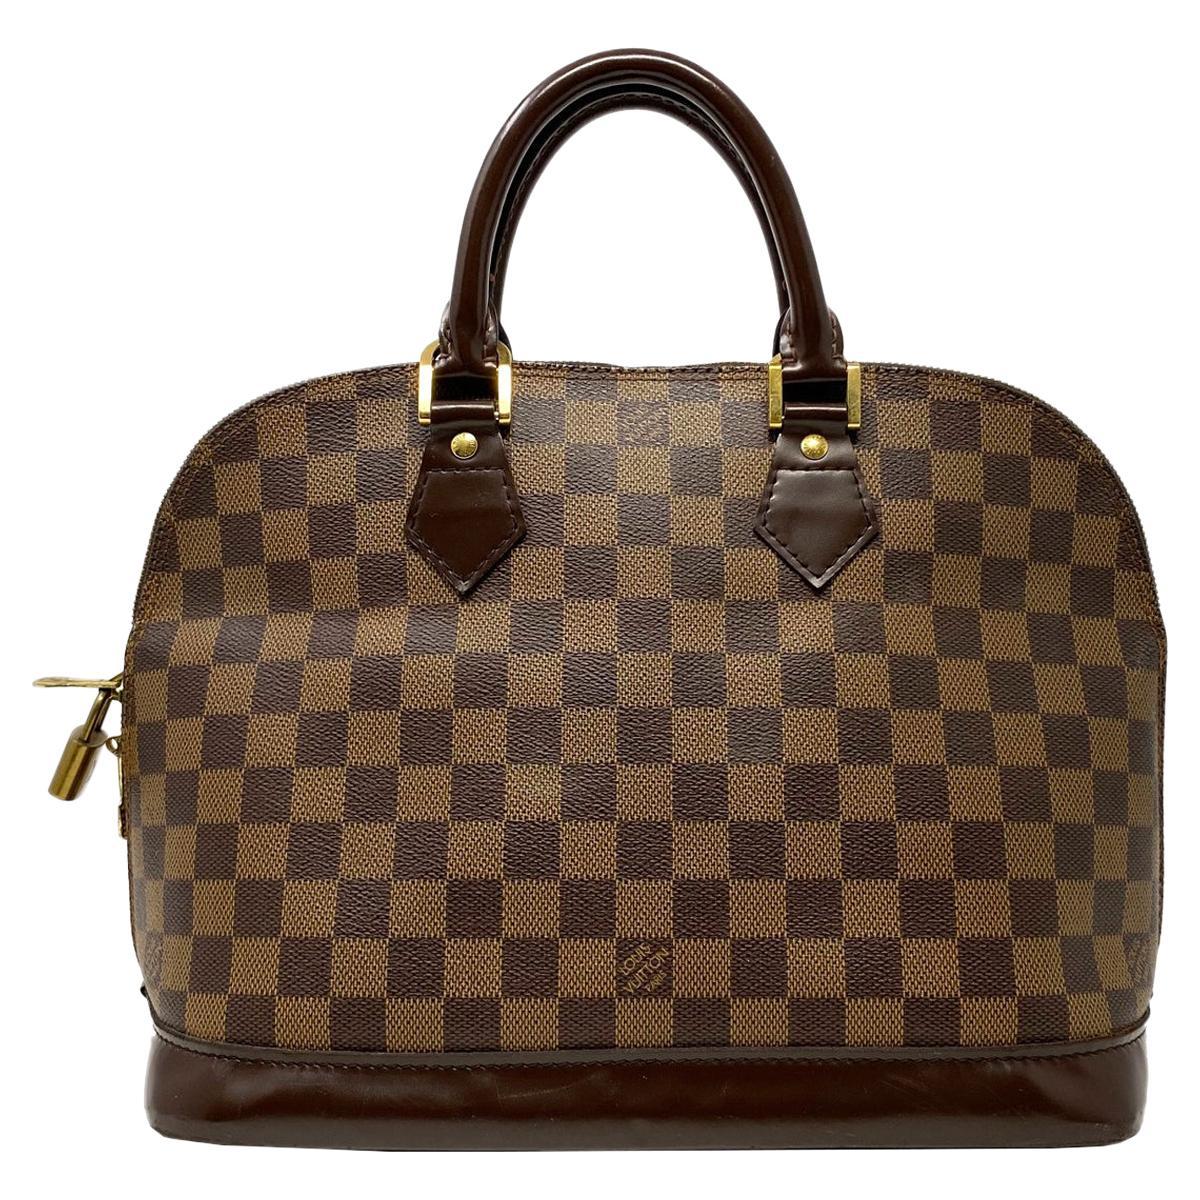 Louis Vuitton Alma Pm Damier Ebene Leather Canvas Handbag